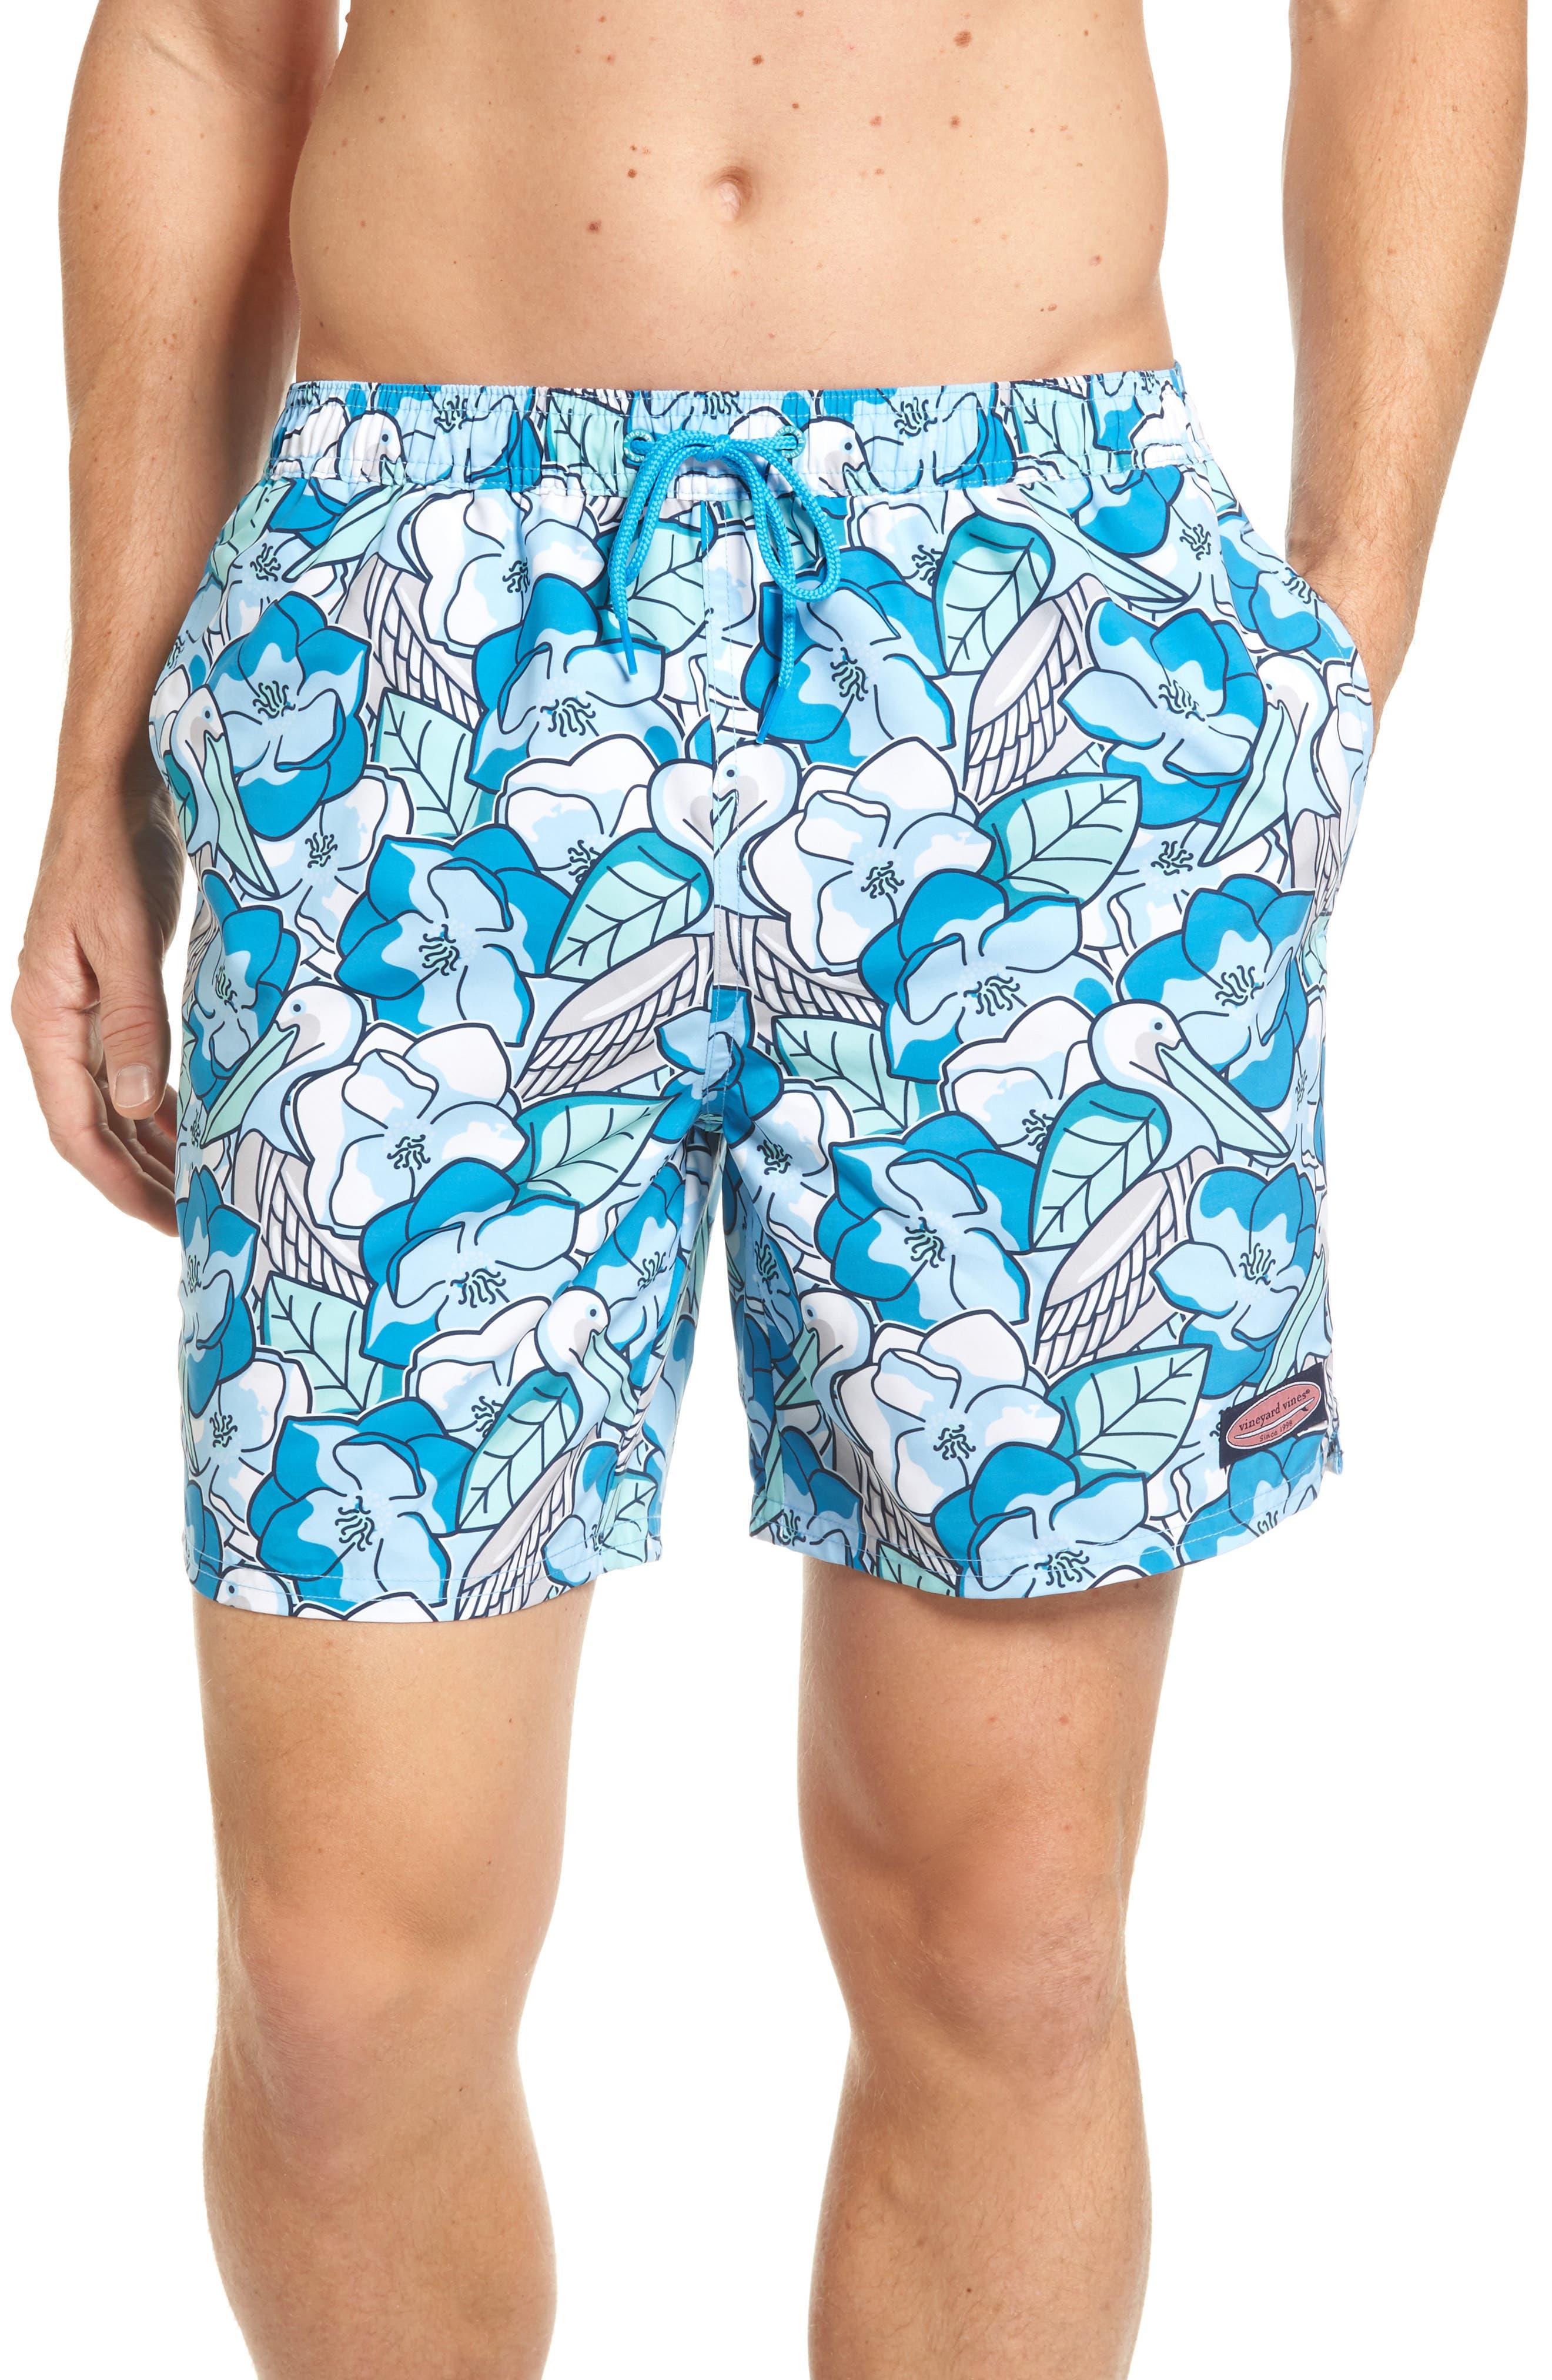 Pelican Magnolias Chappy Swim Trunks,                         Main,                         color, Airy Blue